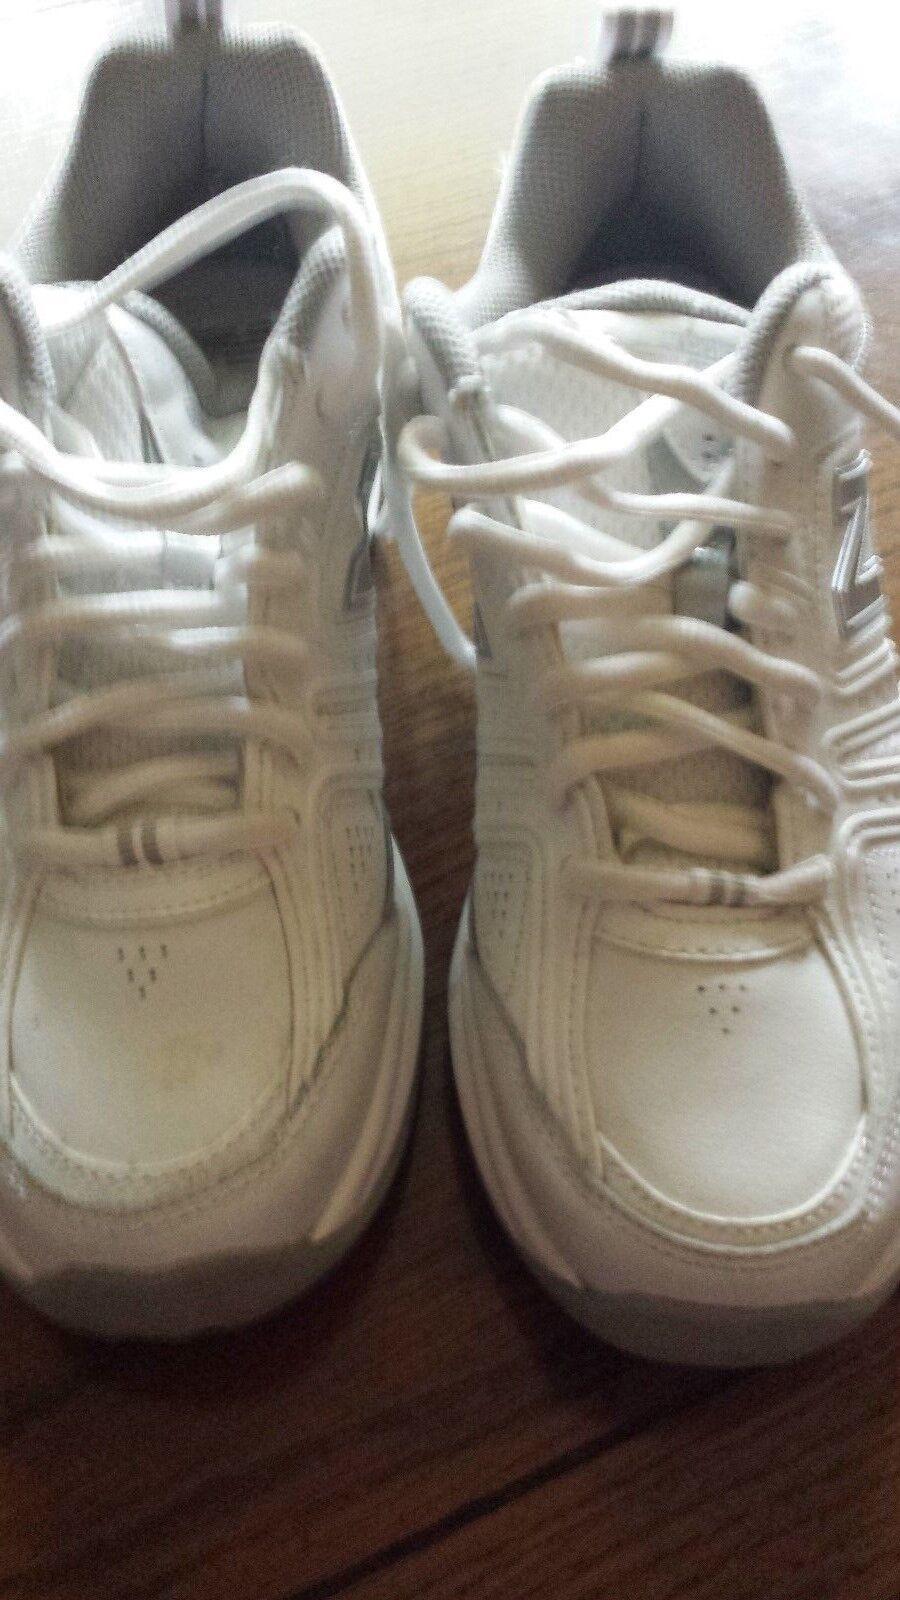 New Balance Athletic shoes Womens Size 7.5 US WX409SL2 New Balance 409